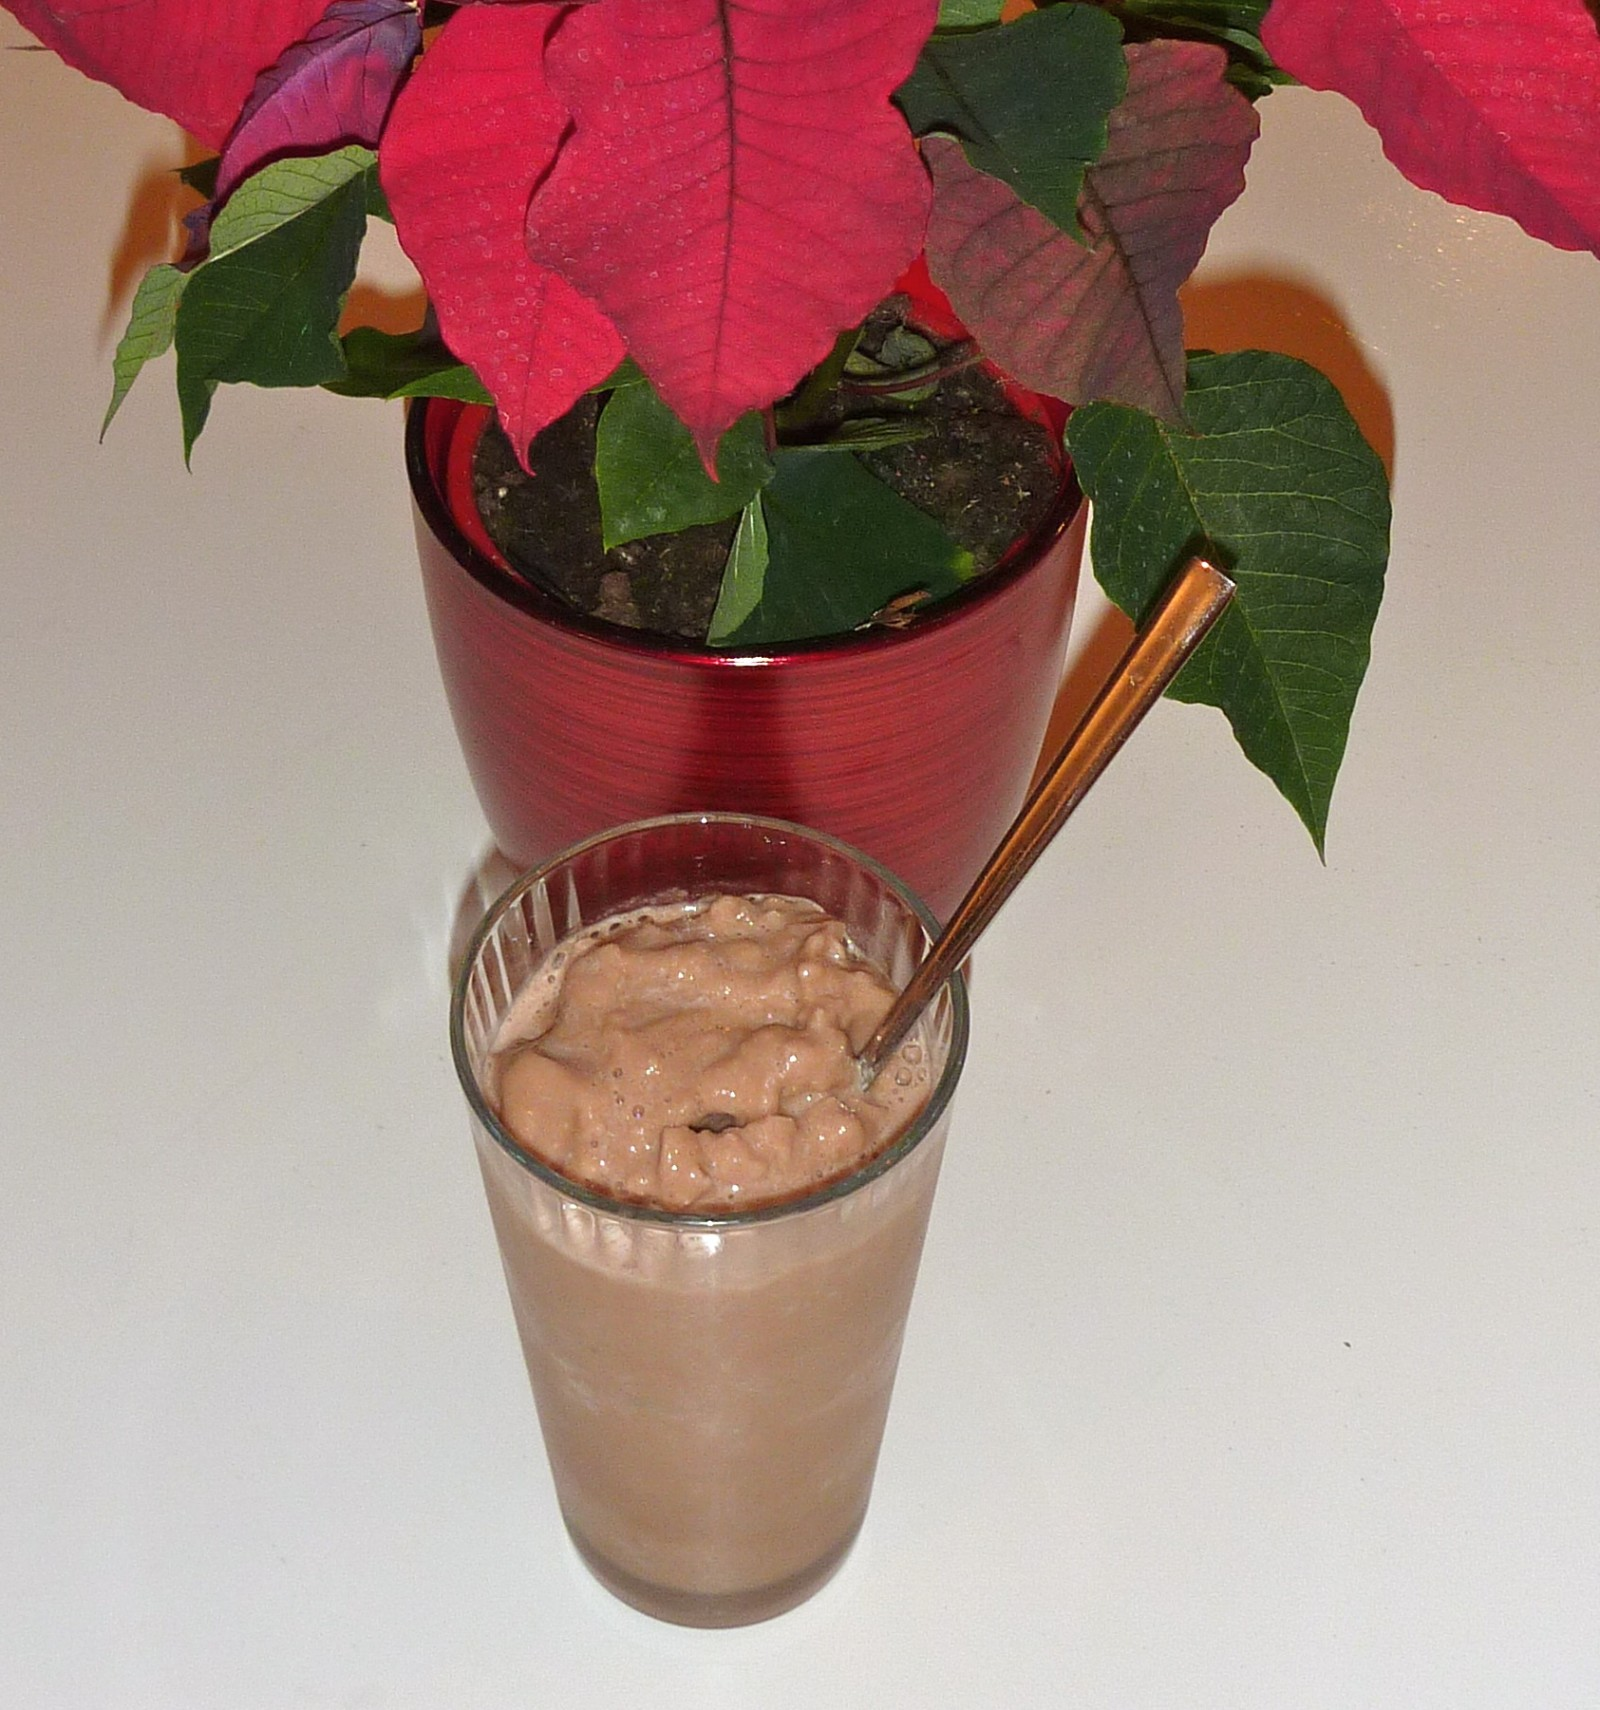 100 calorie chocolate smoothie